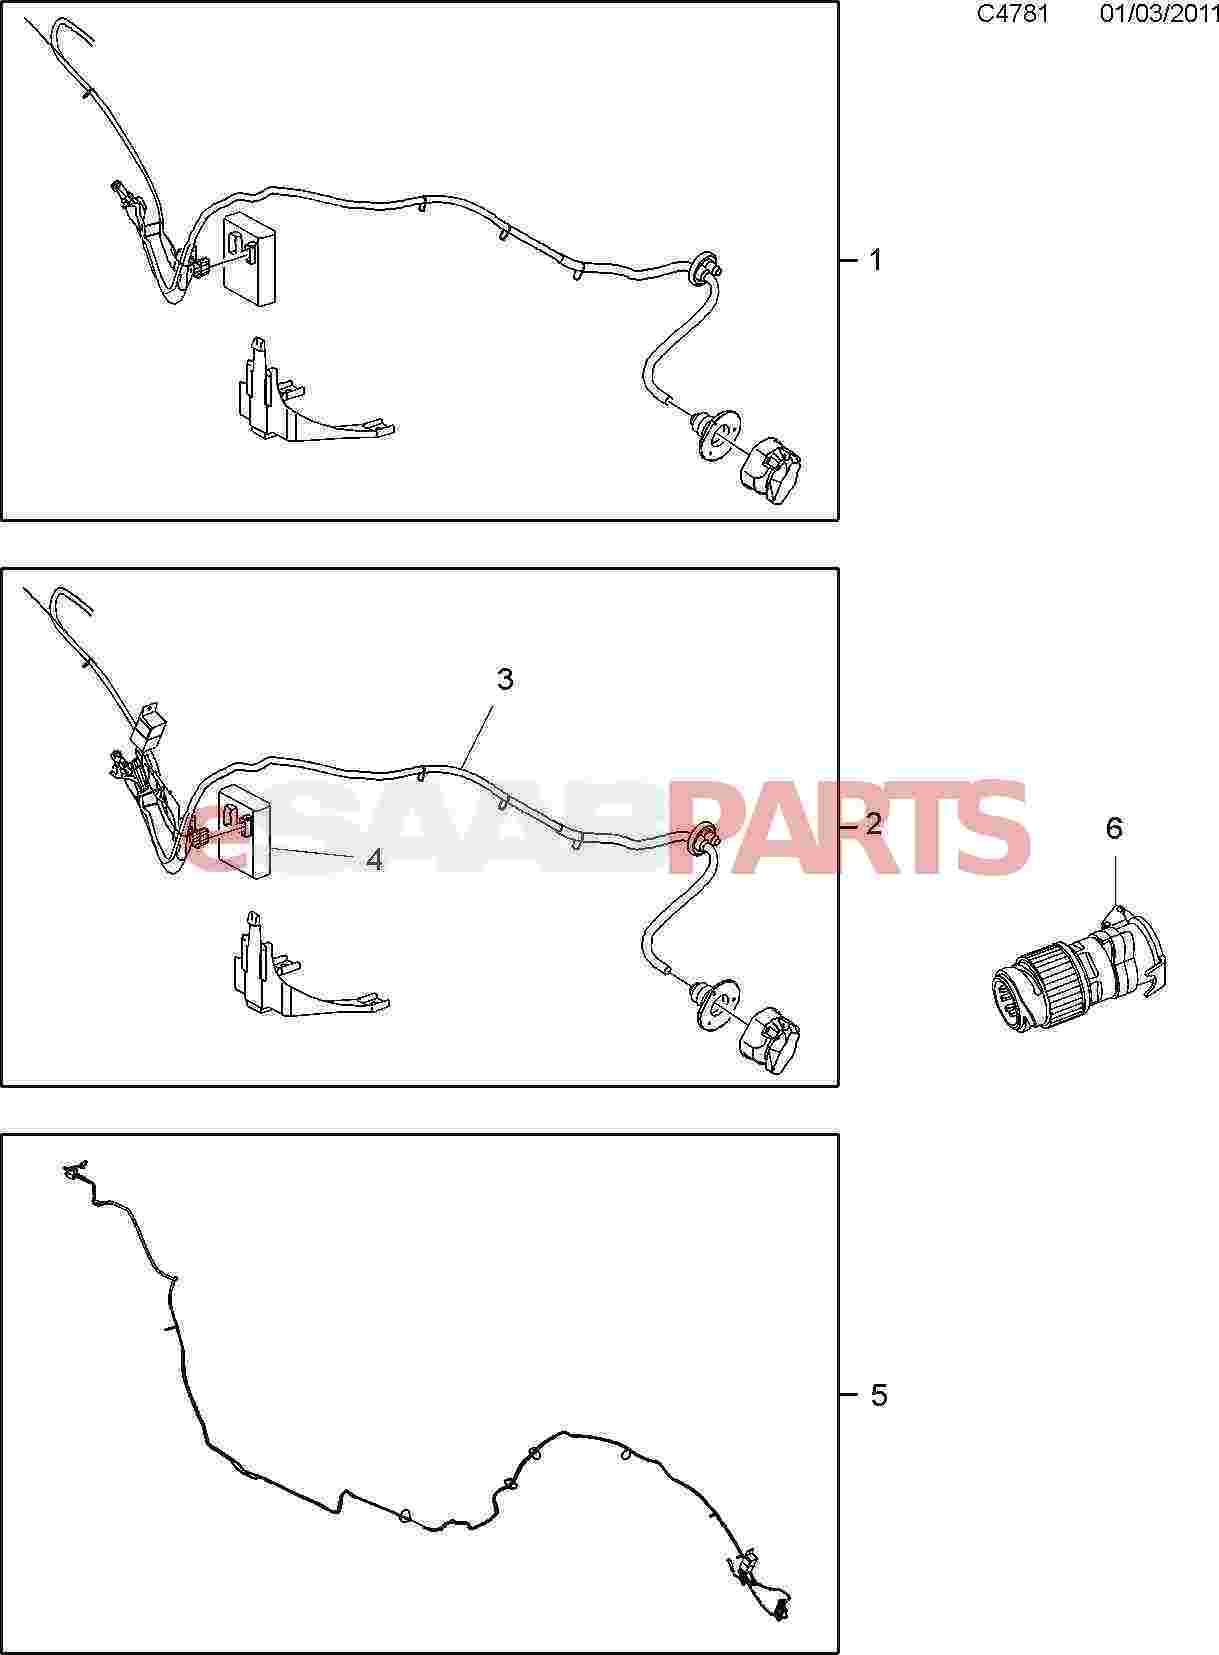 Saab 9 5 Trailer Wiring Harness Radio Stereo 3 Esaabpartscom 650 Electrical Parts On